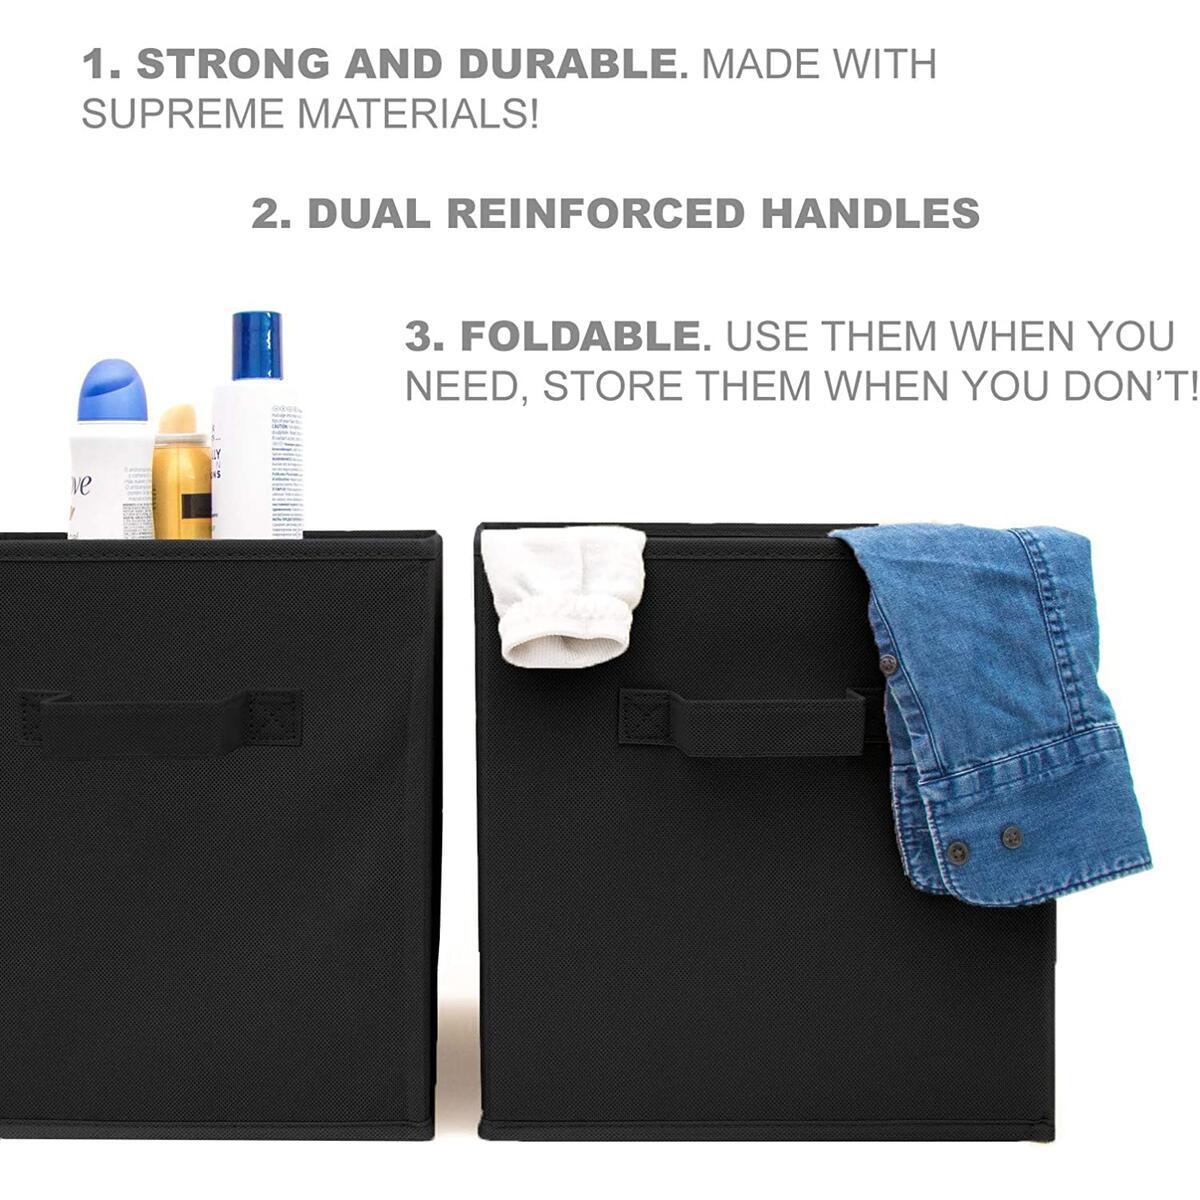 Storage Cubes - 9 Pack - Durable and Sturdy Storage Cube Bins (Black)